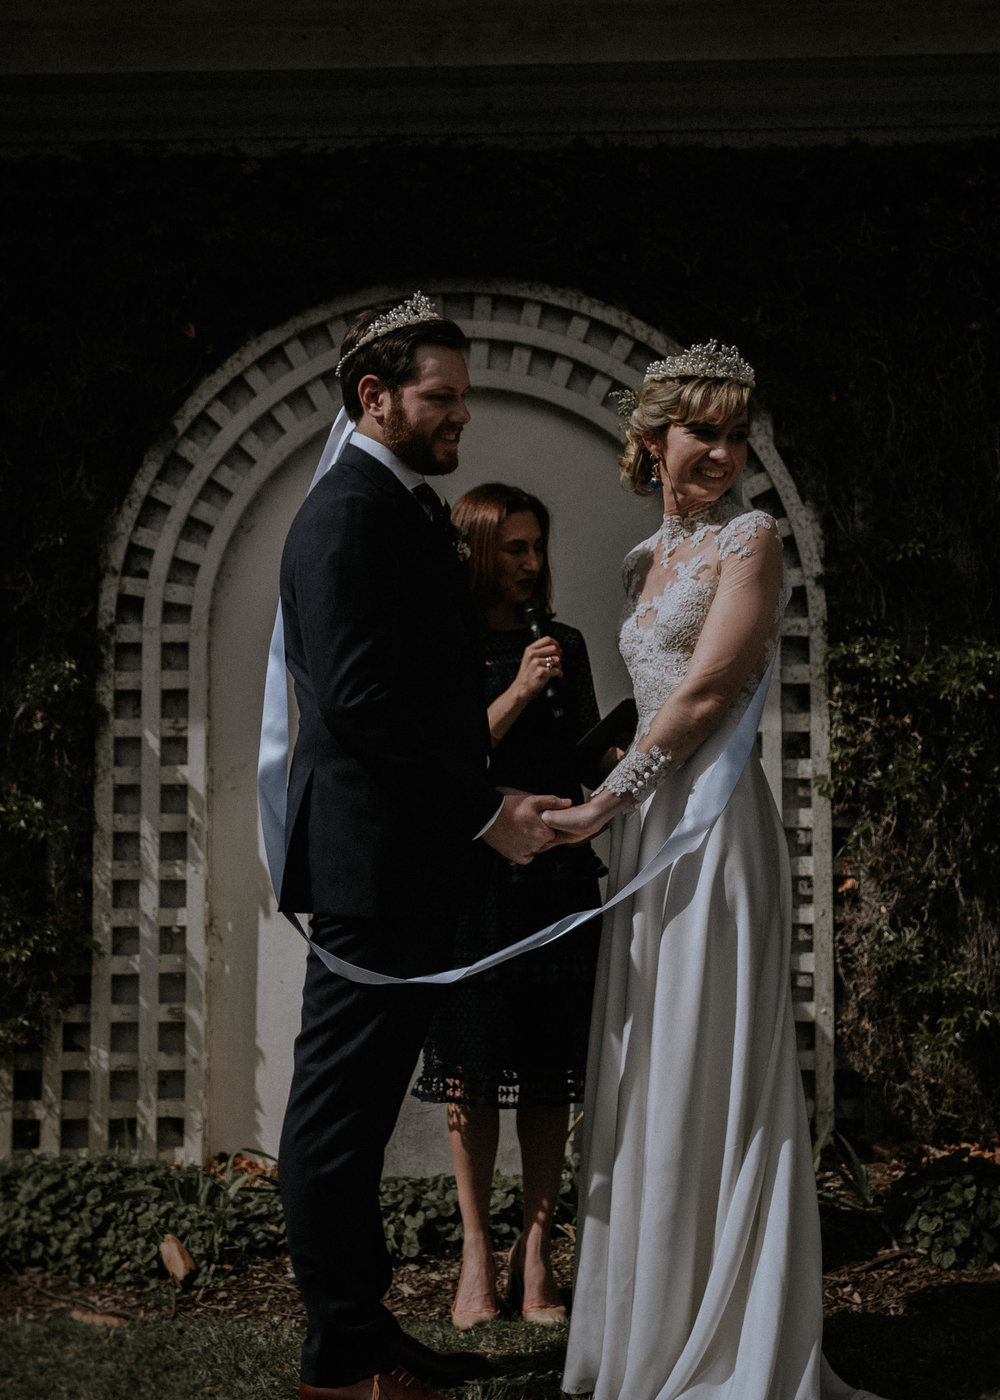 R+M_elopement wedding photography_kings & thieves_blog (158 of 326).jpg